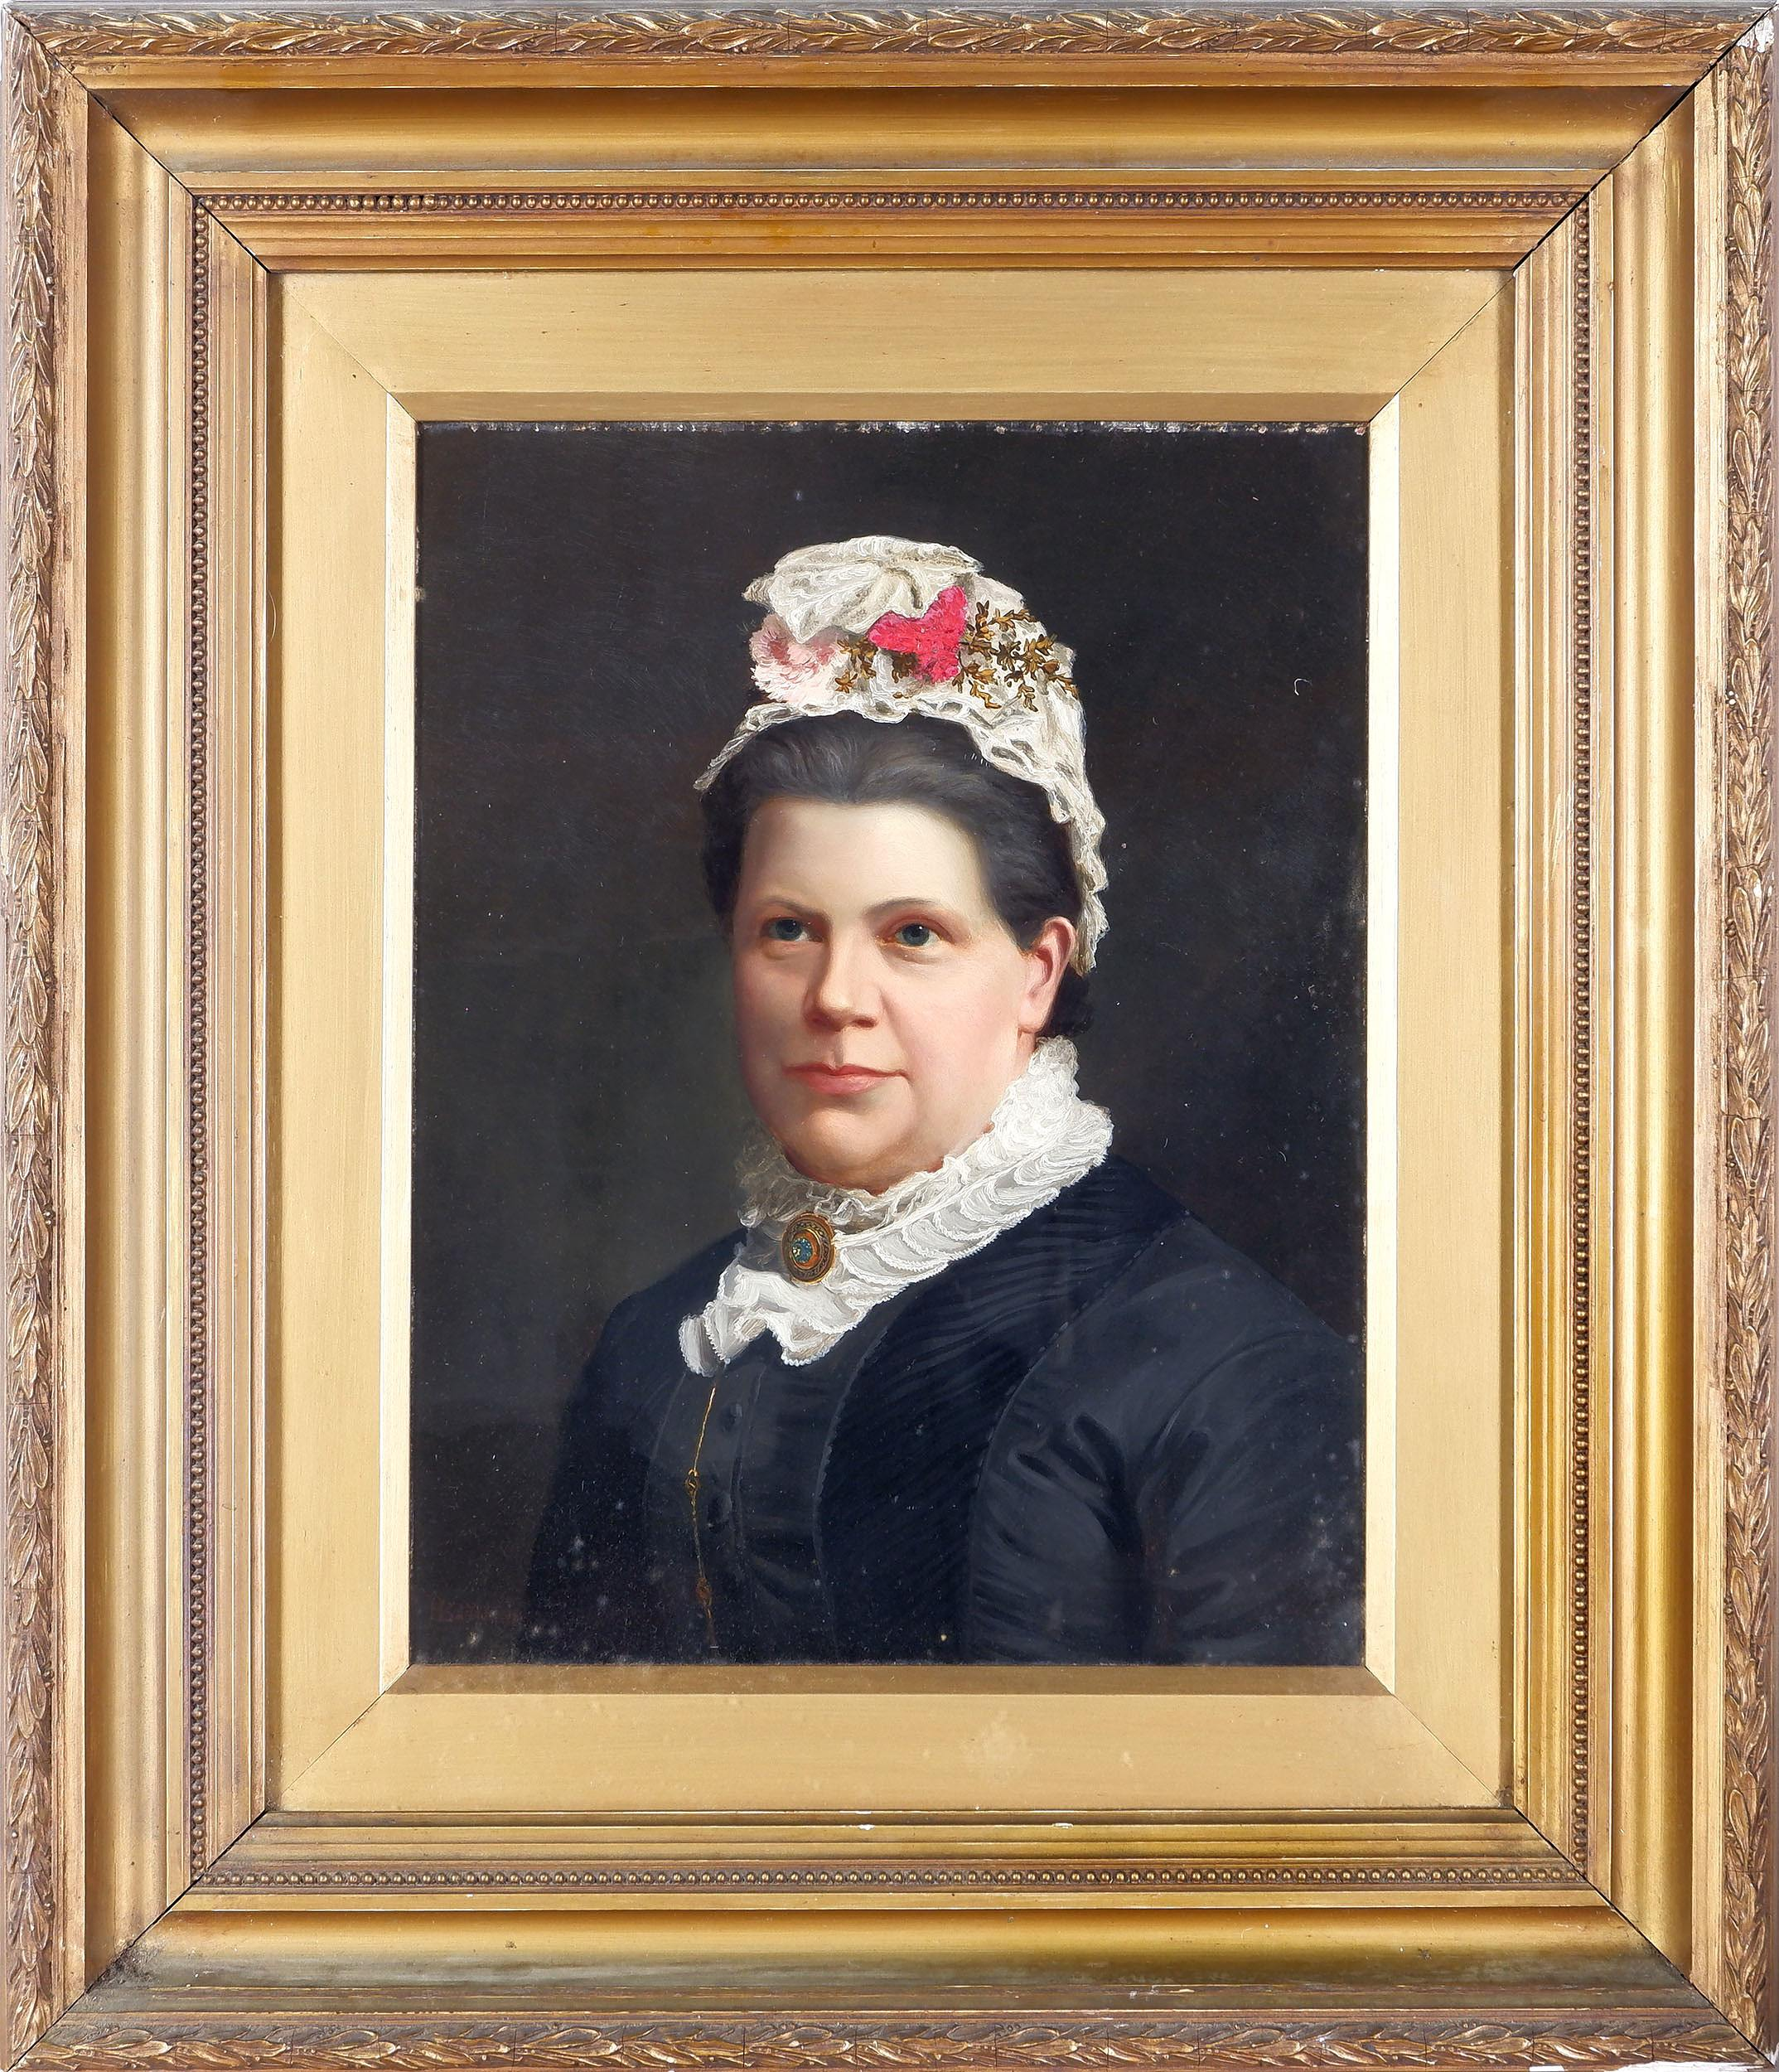 'H Baynton (19th C) Portrait of a Woman, Oil on Board'